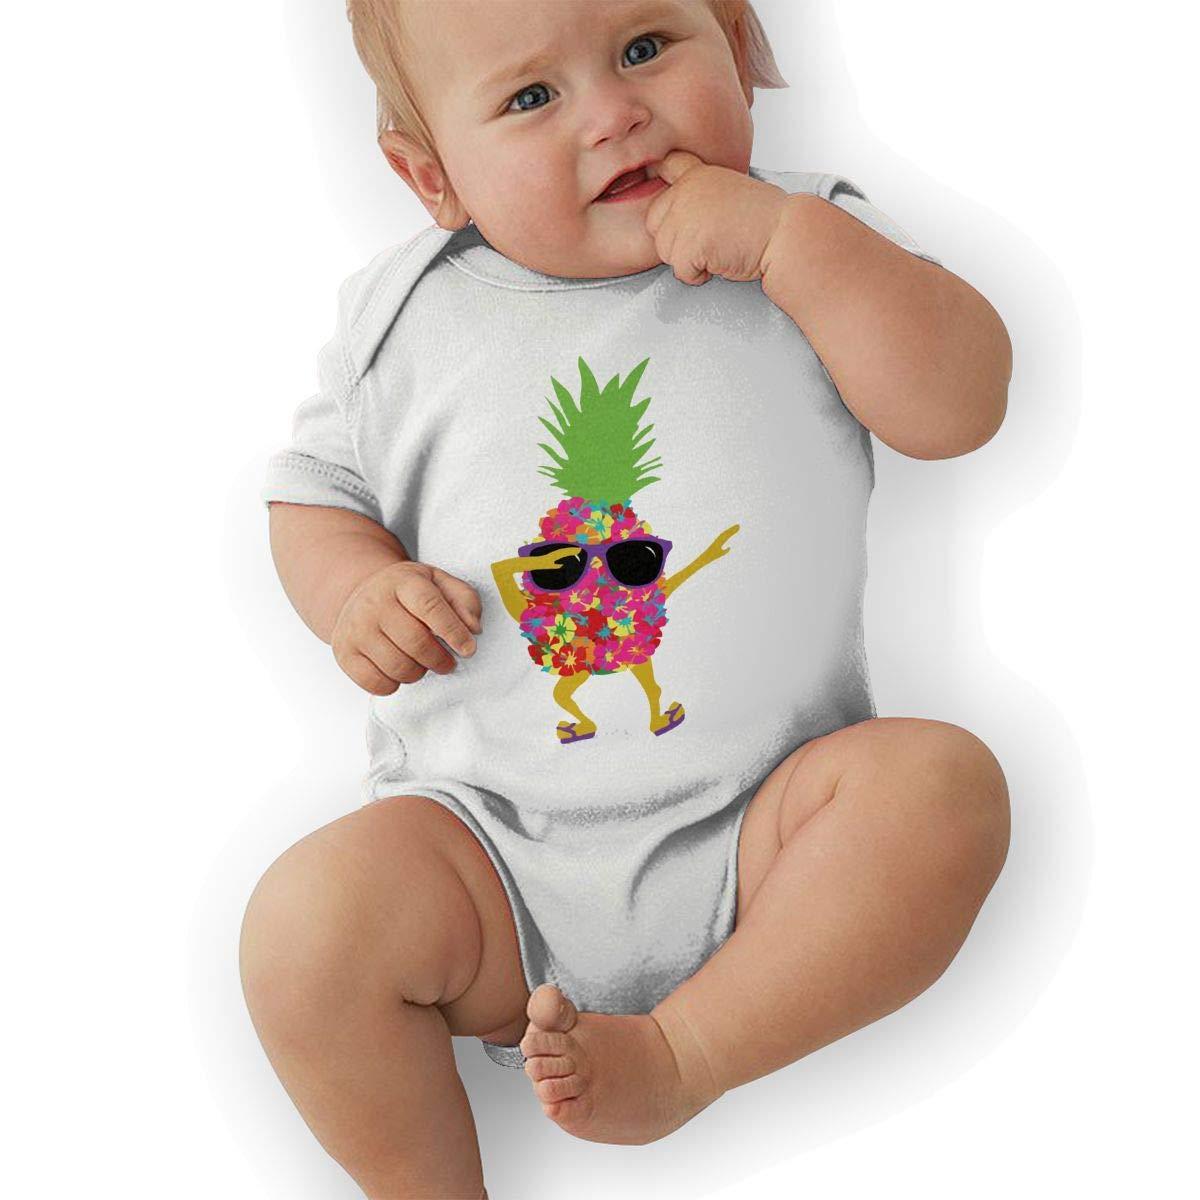 BONLOR Dabbing Cool Sunglasses Pineapple Baby Boys Girls Jumpsuit Overall Romper Bodysuit Summer Clothes White